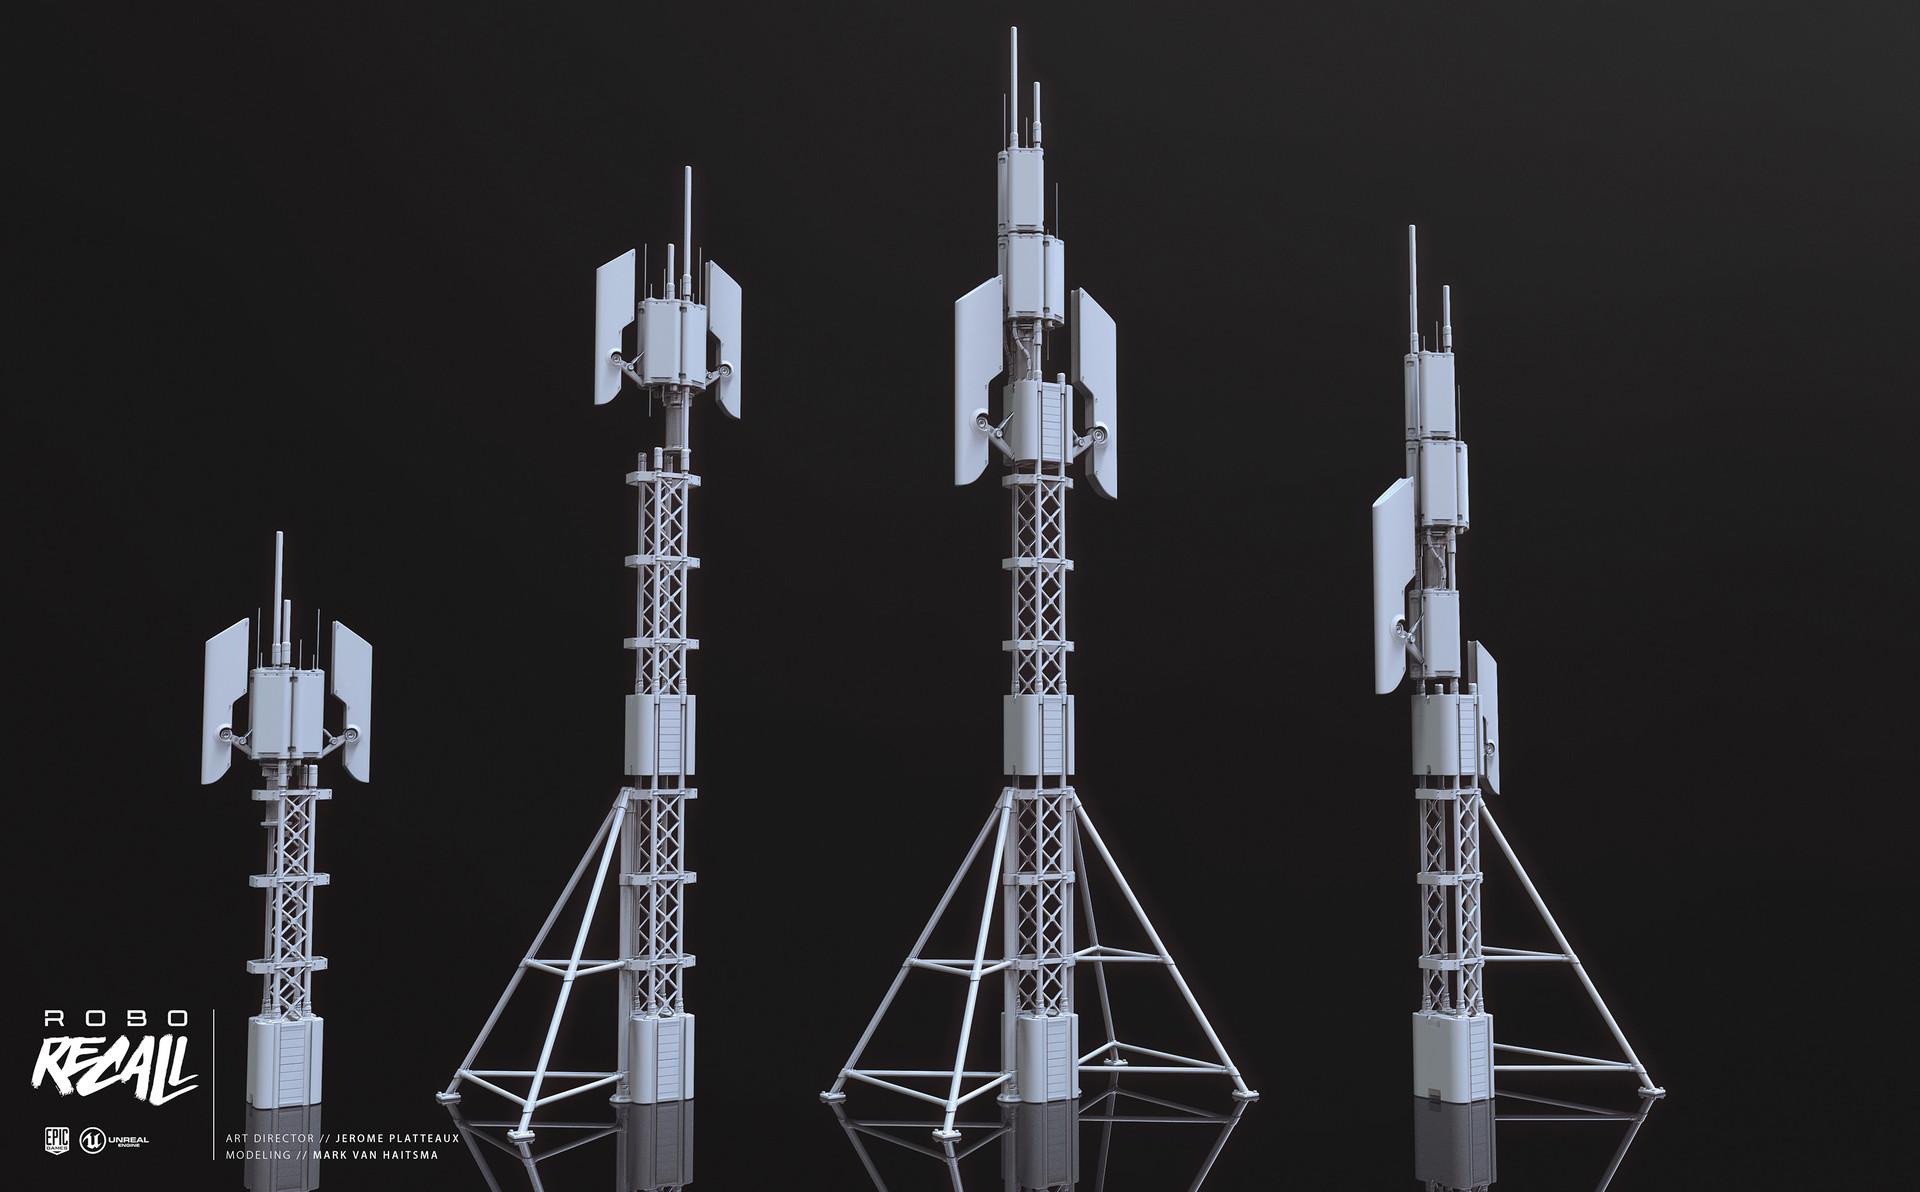 Mark van haitsma antennas large gray